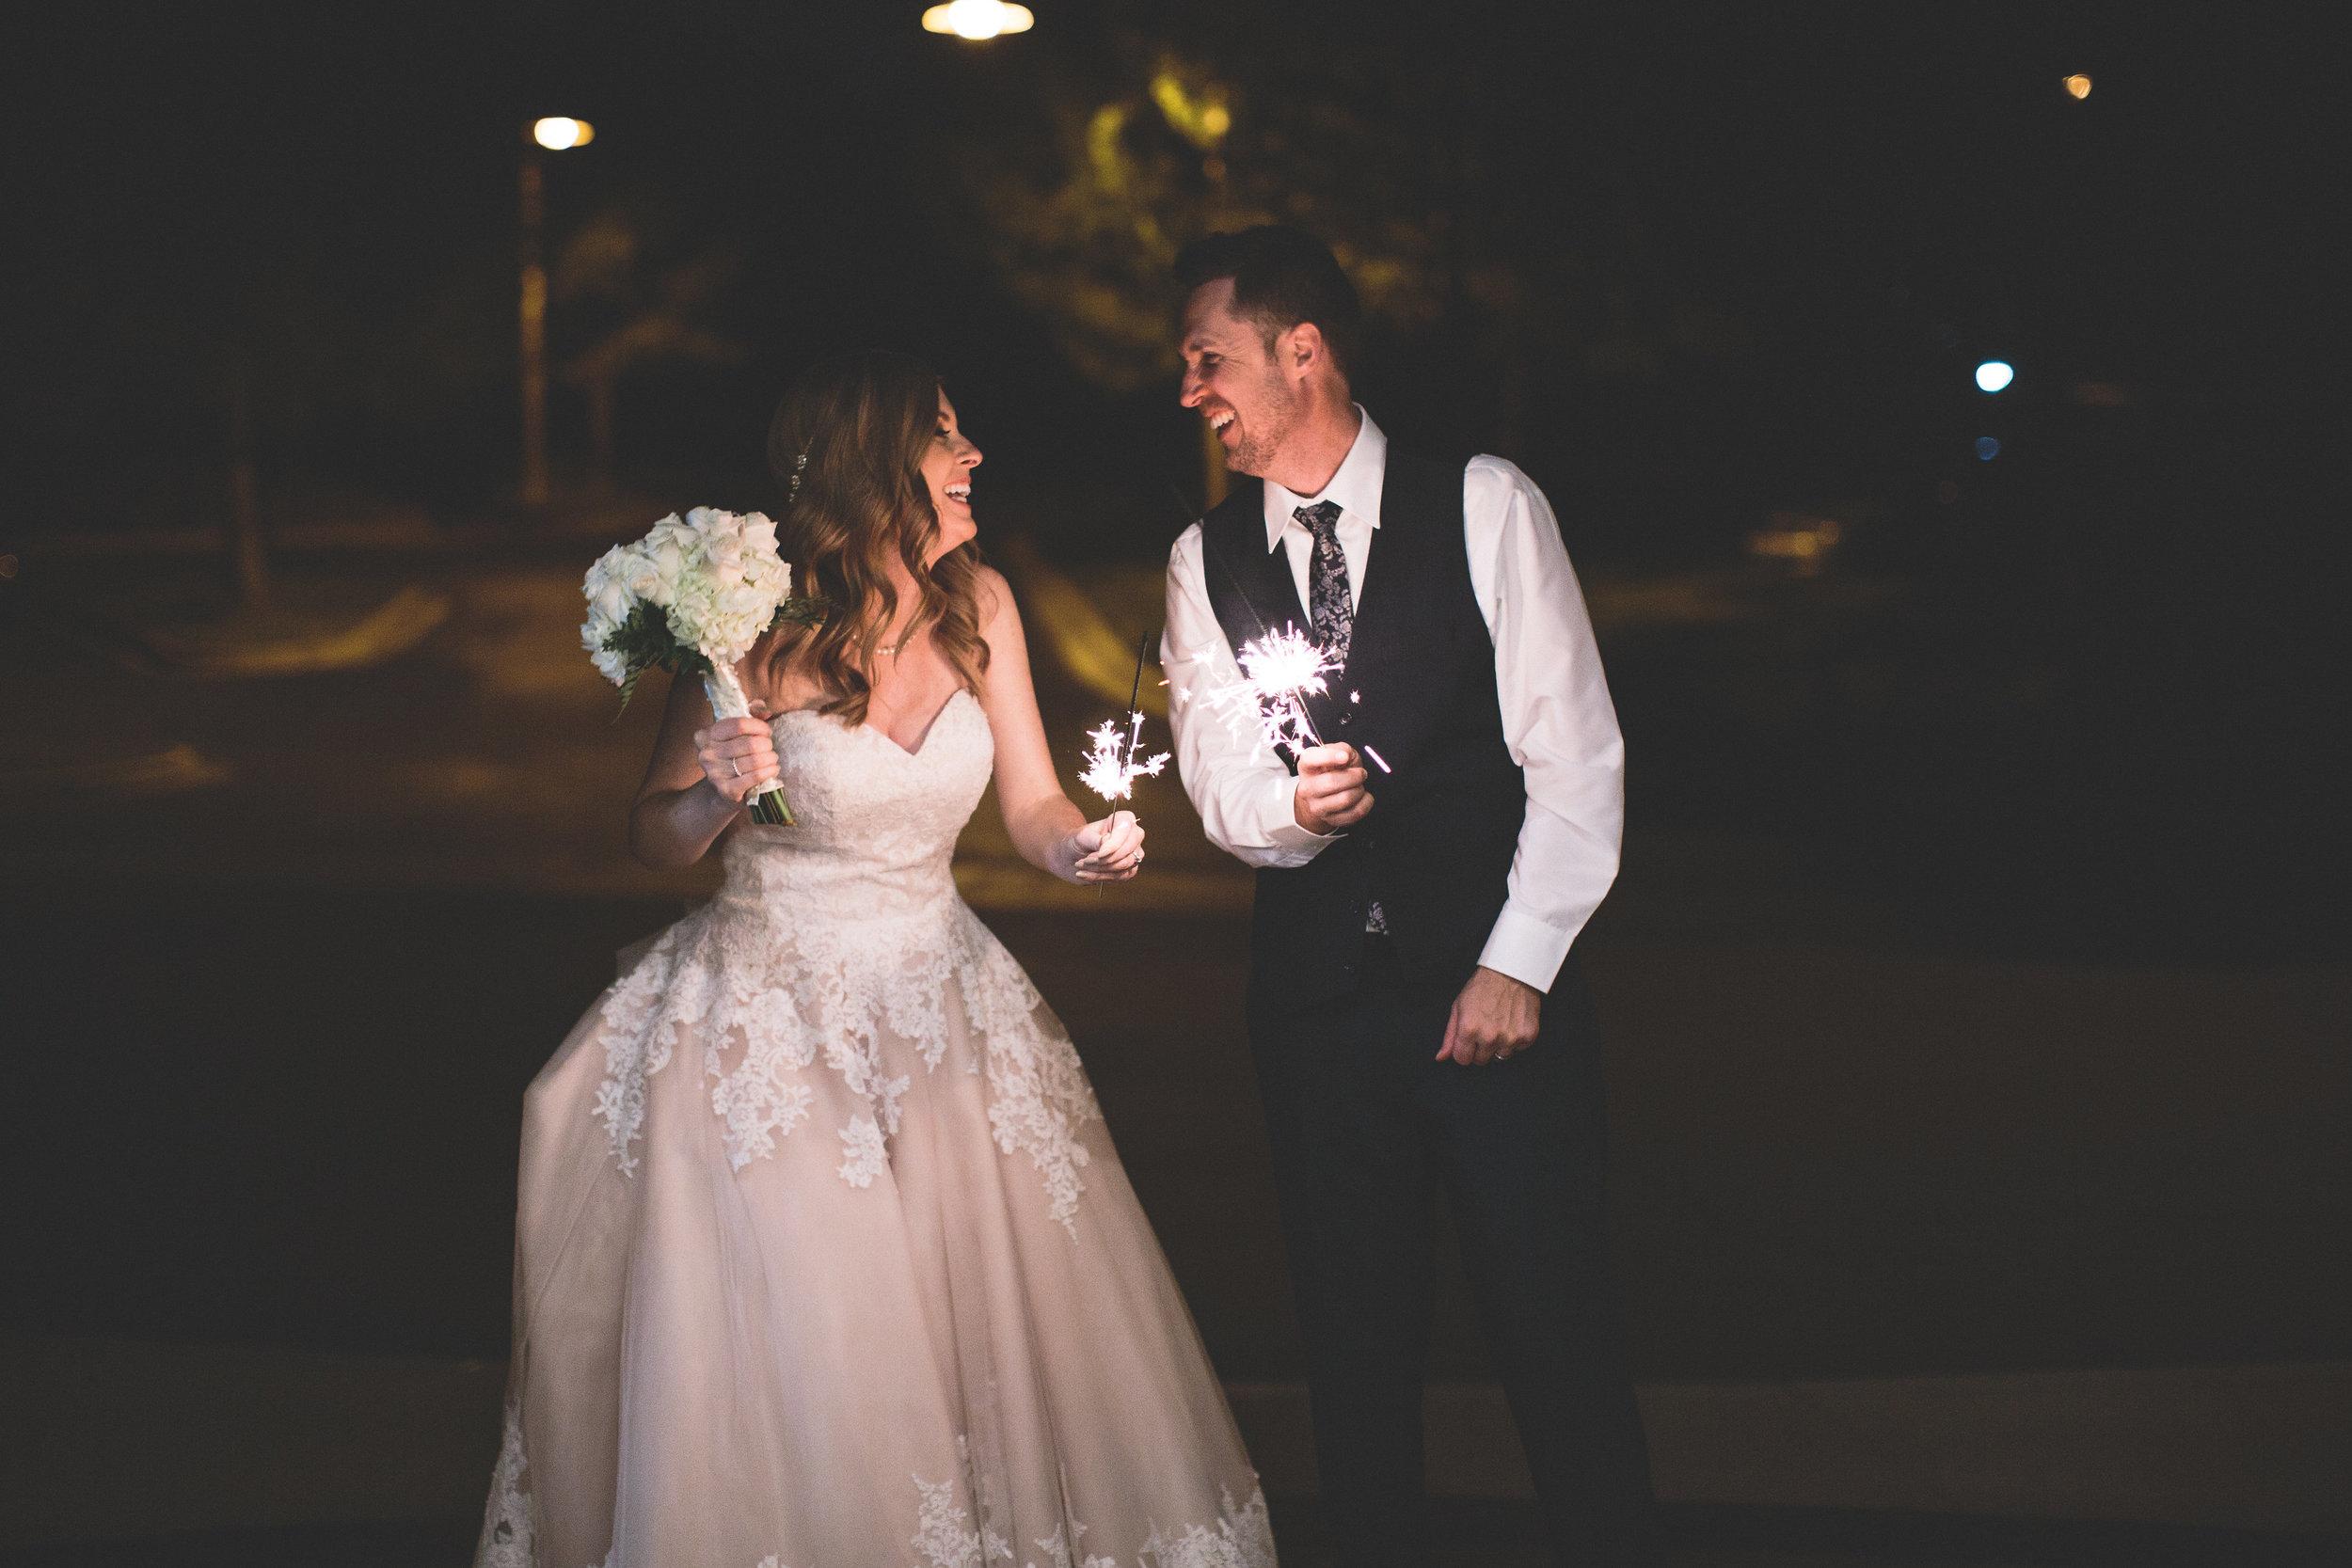 lindsey-and-ryan-intimate-winter-wedding47.jpg